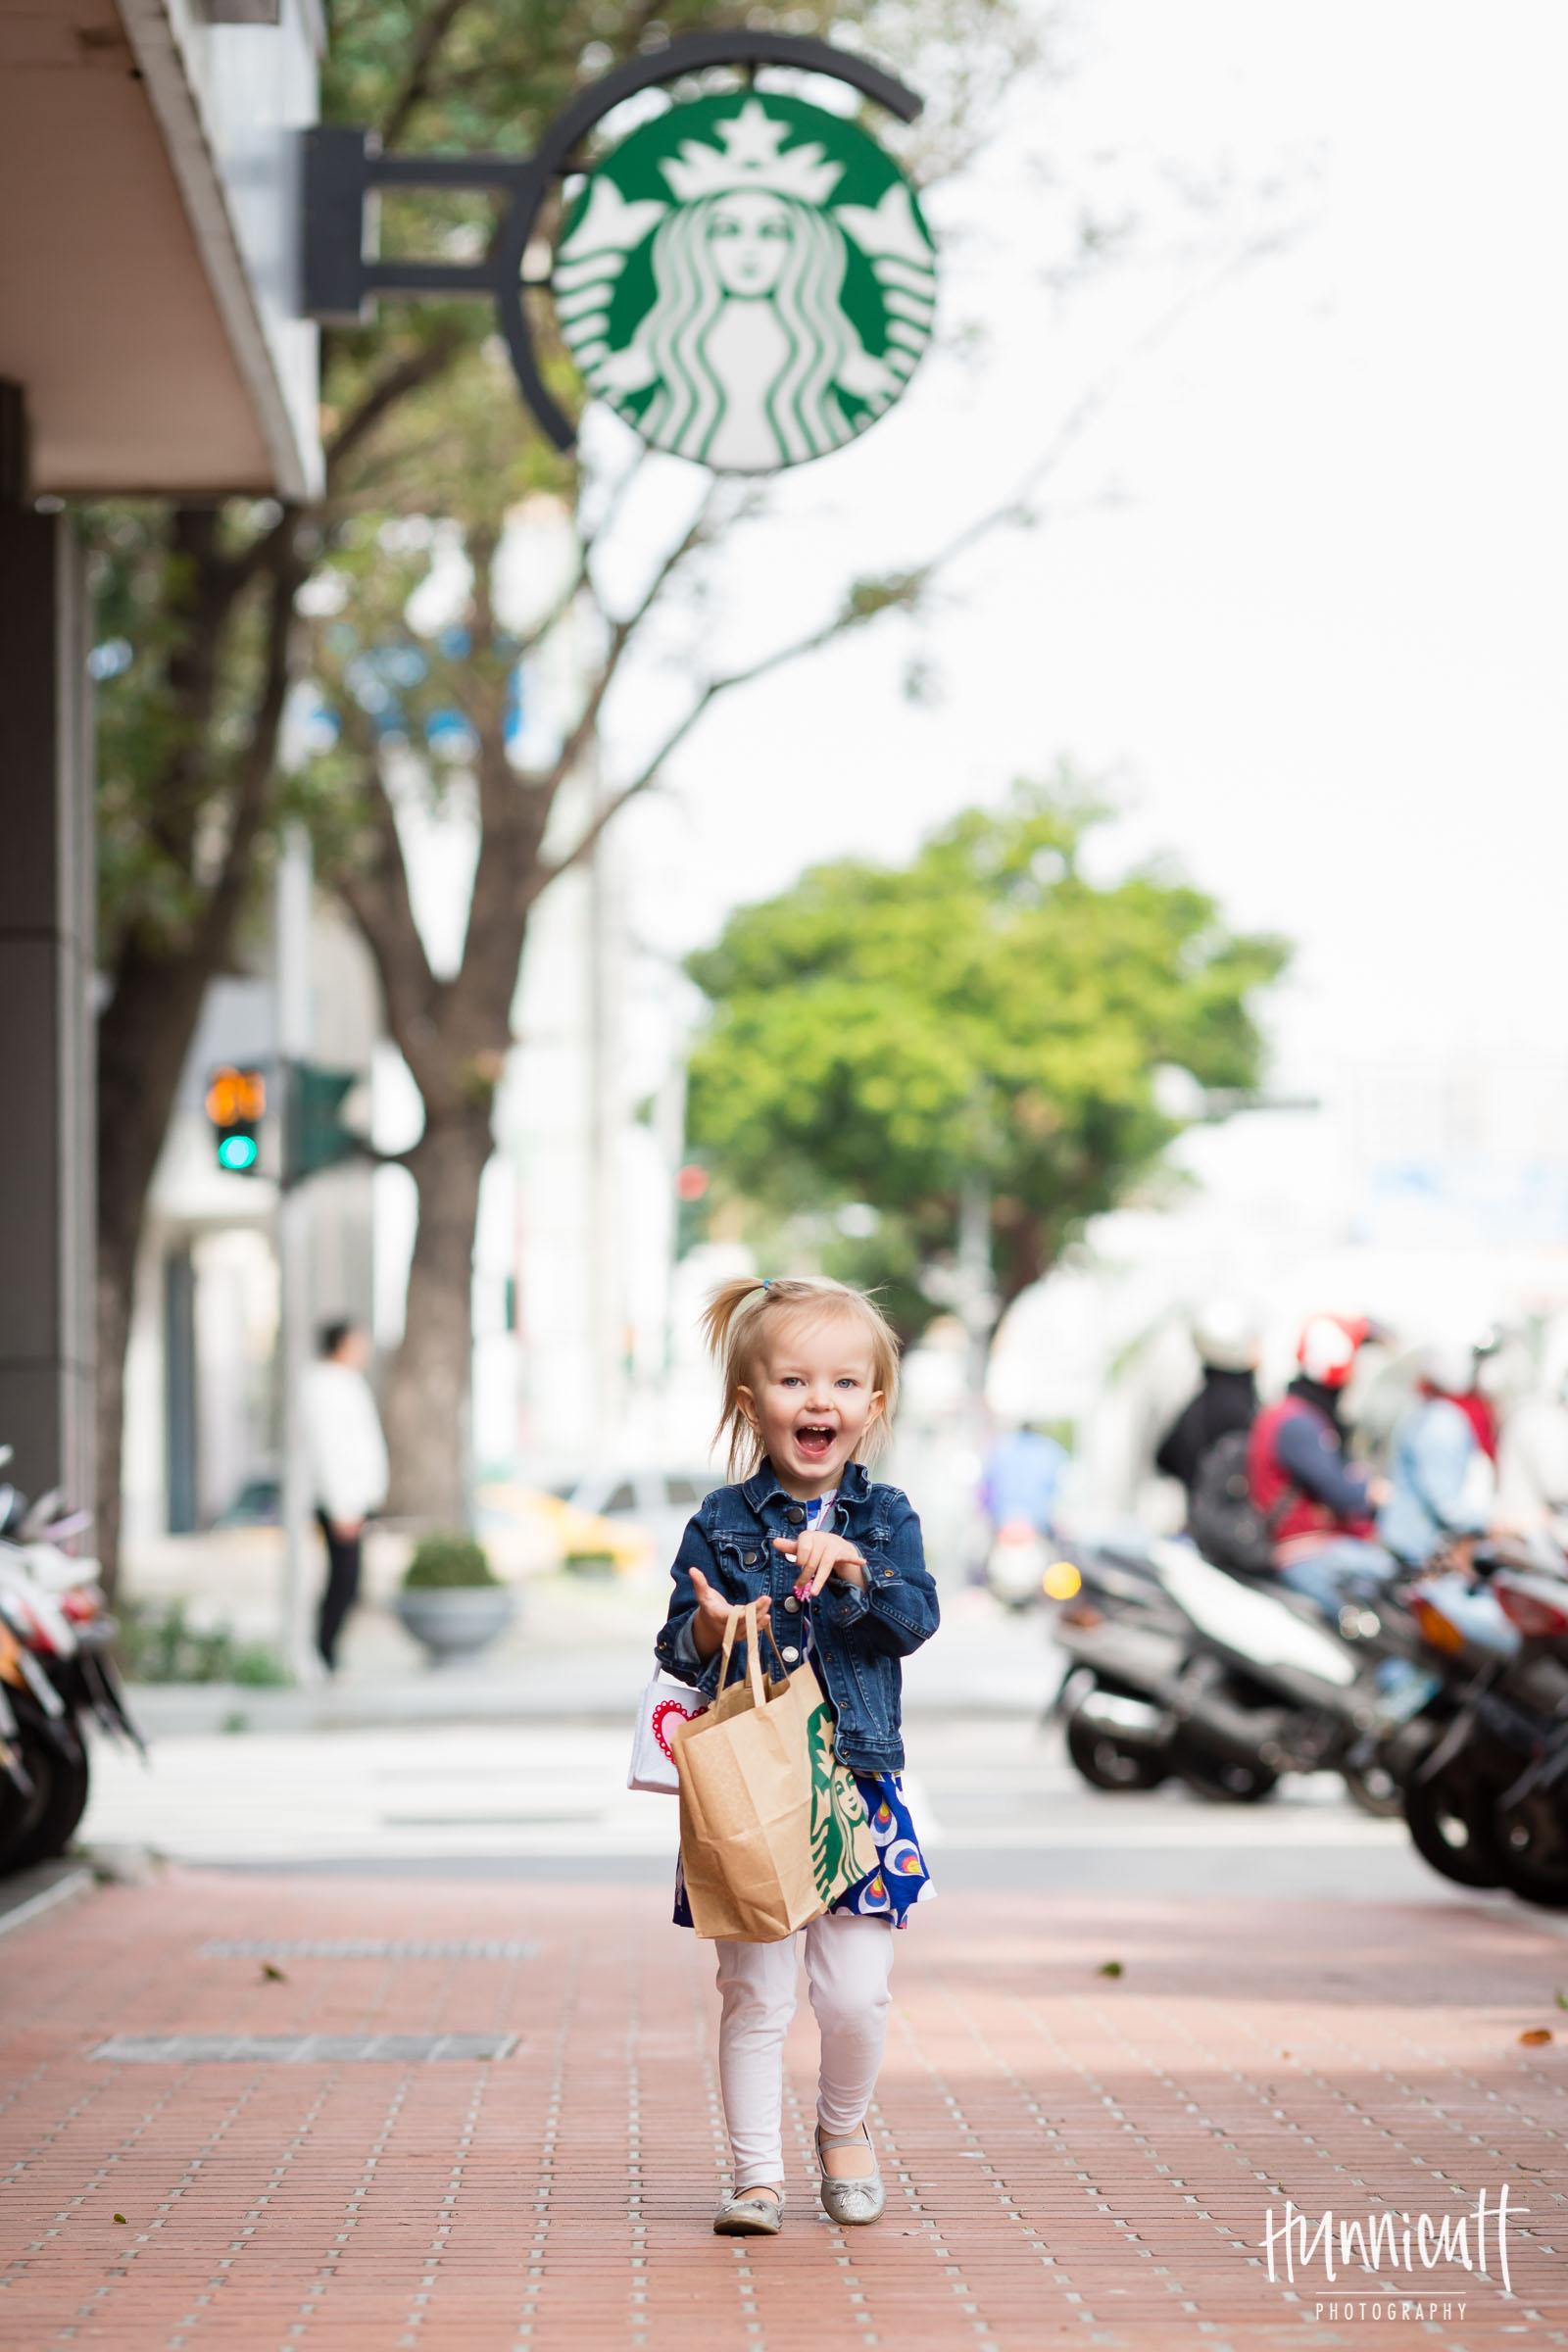 smiling girl carrying a Starbucks sack by Rebecca Hunnicutt Farren